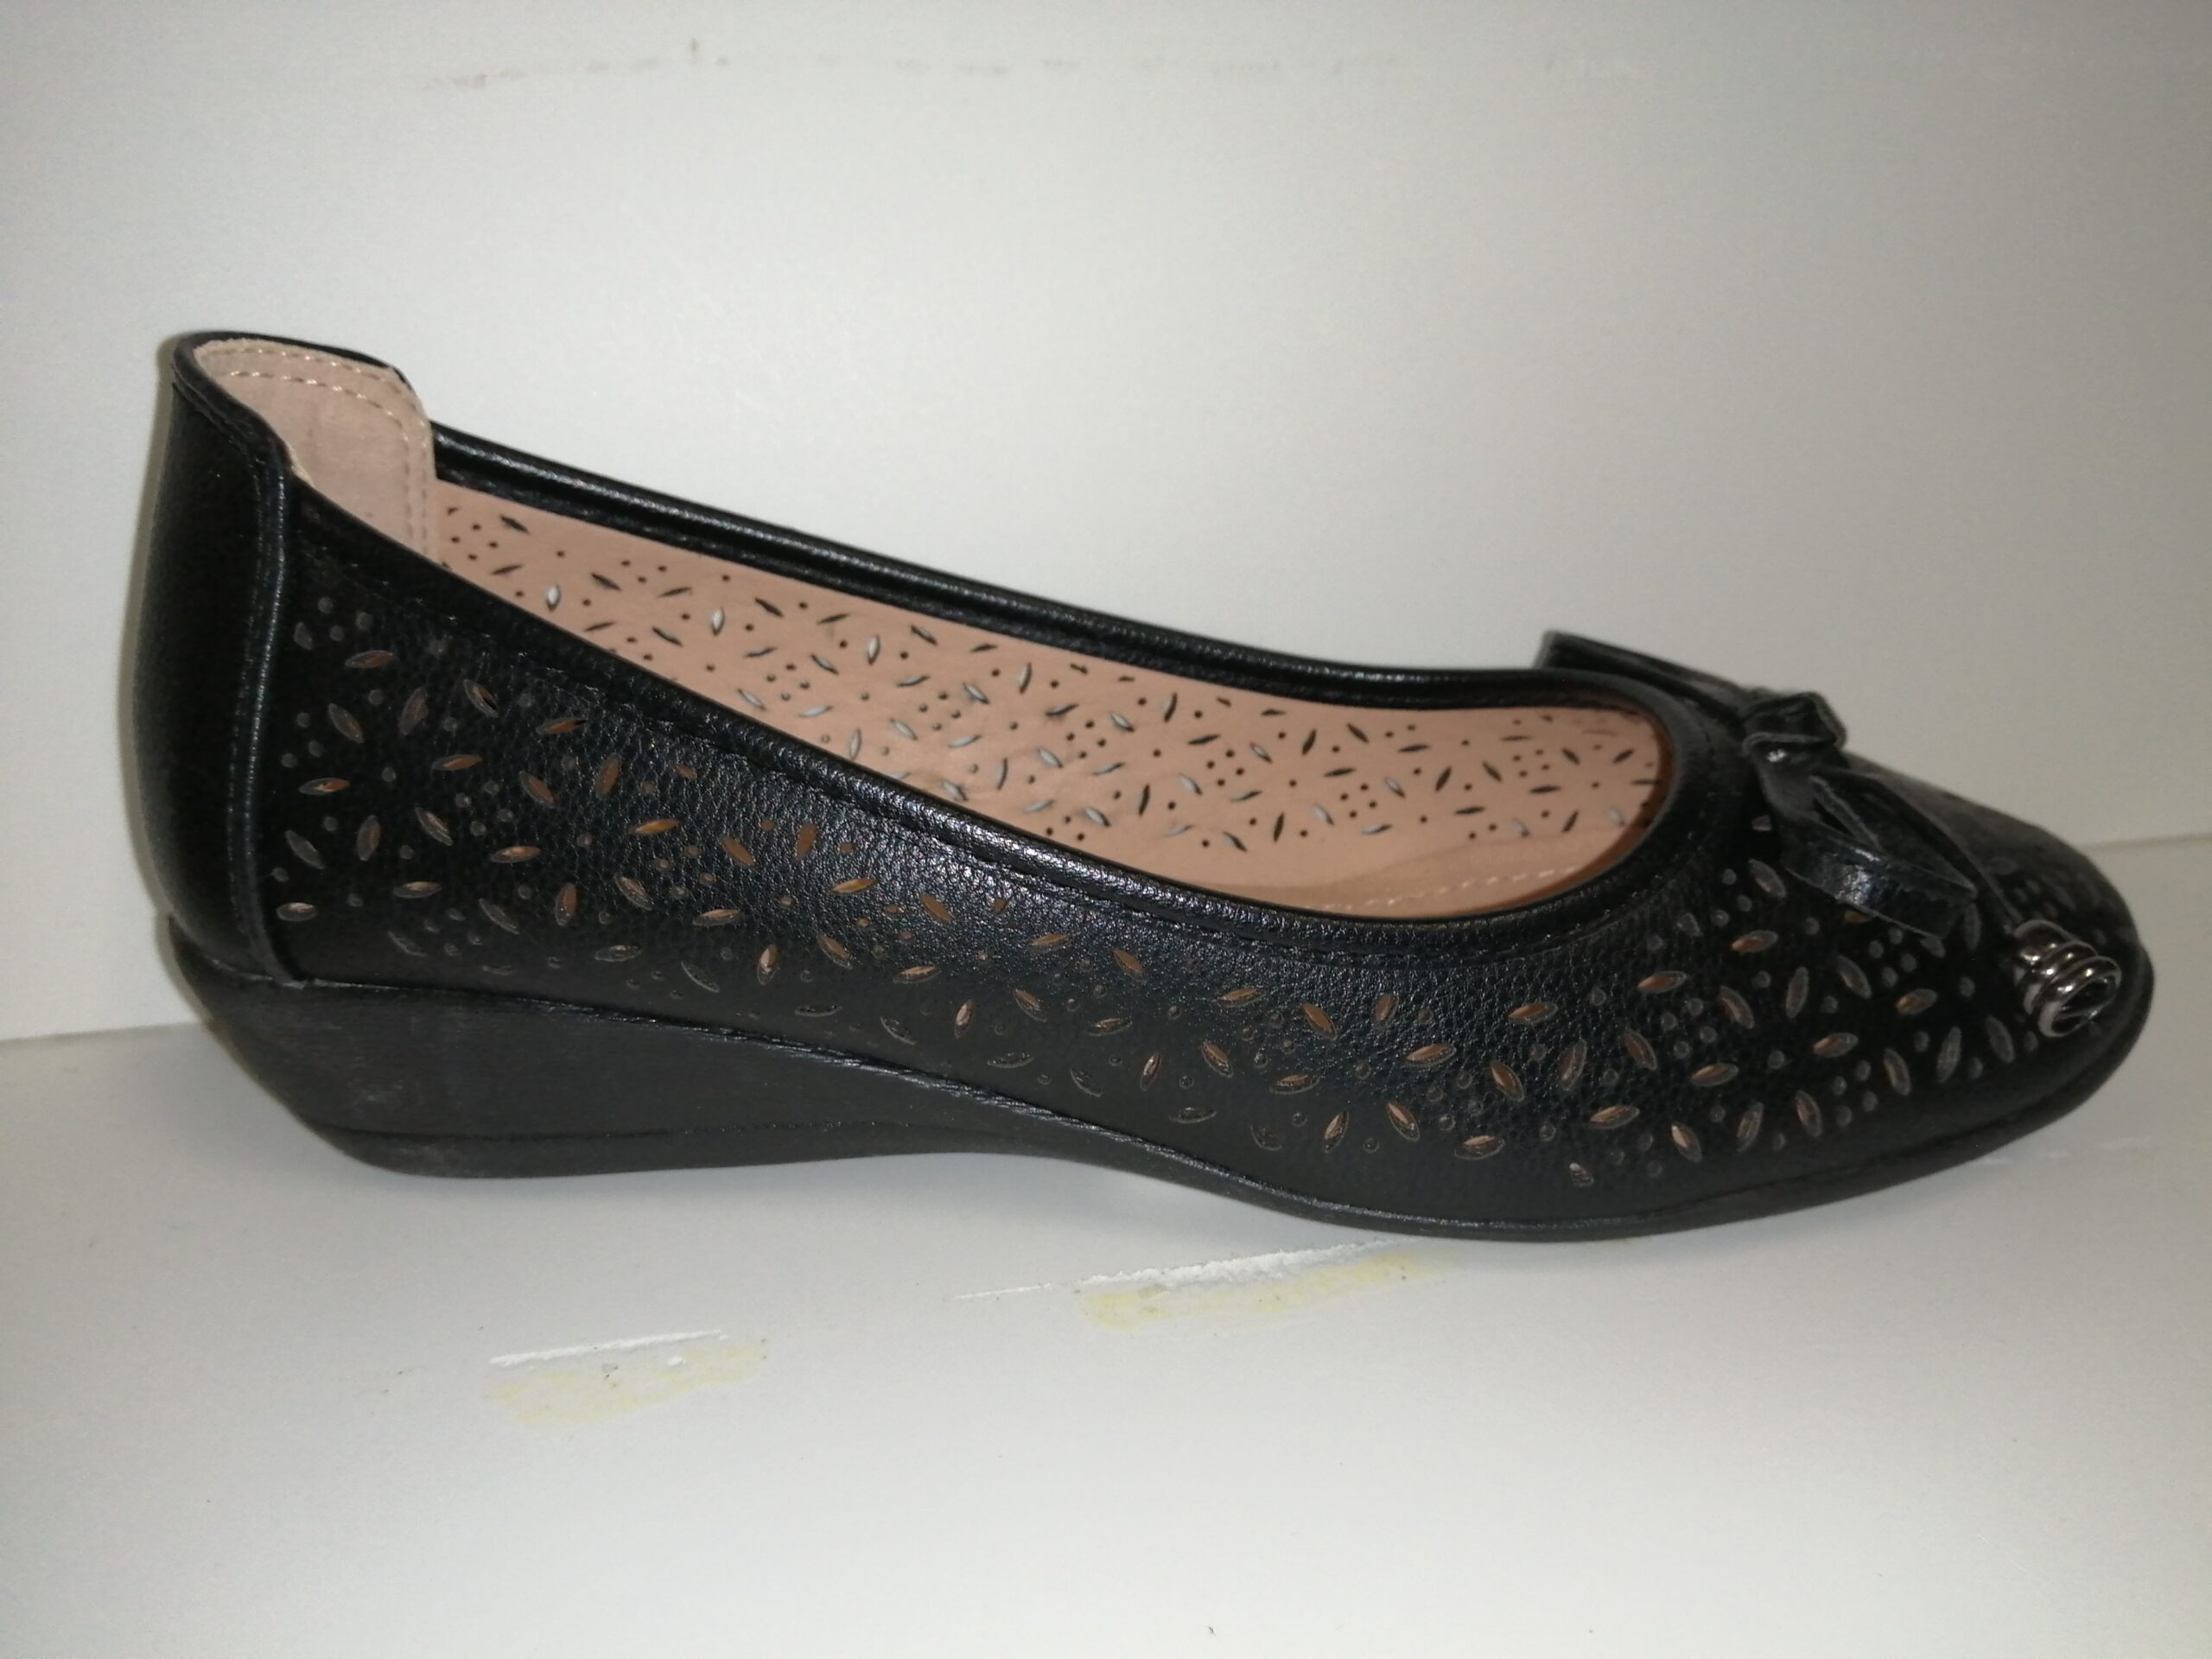 Zapato sra bailarina negra calada sra BL1728